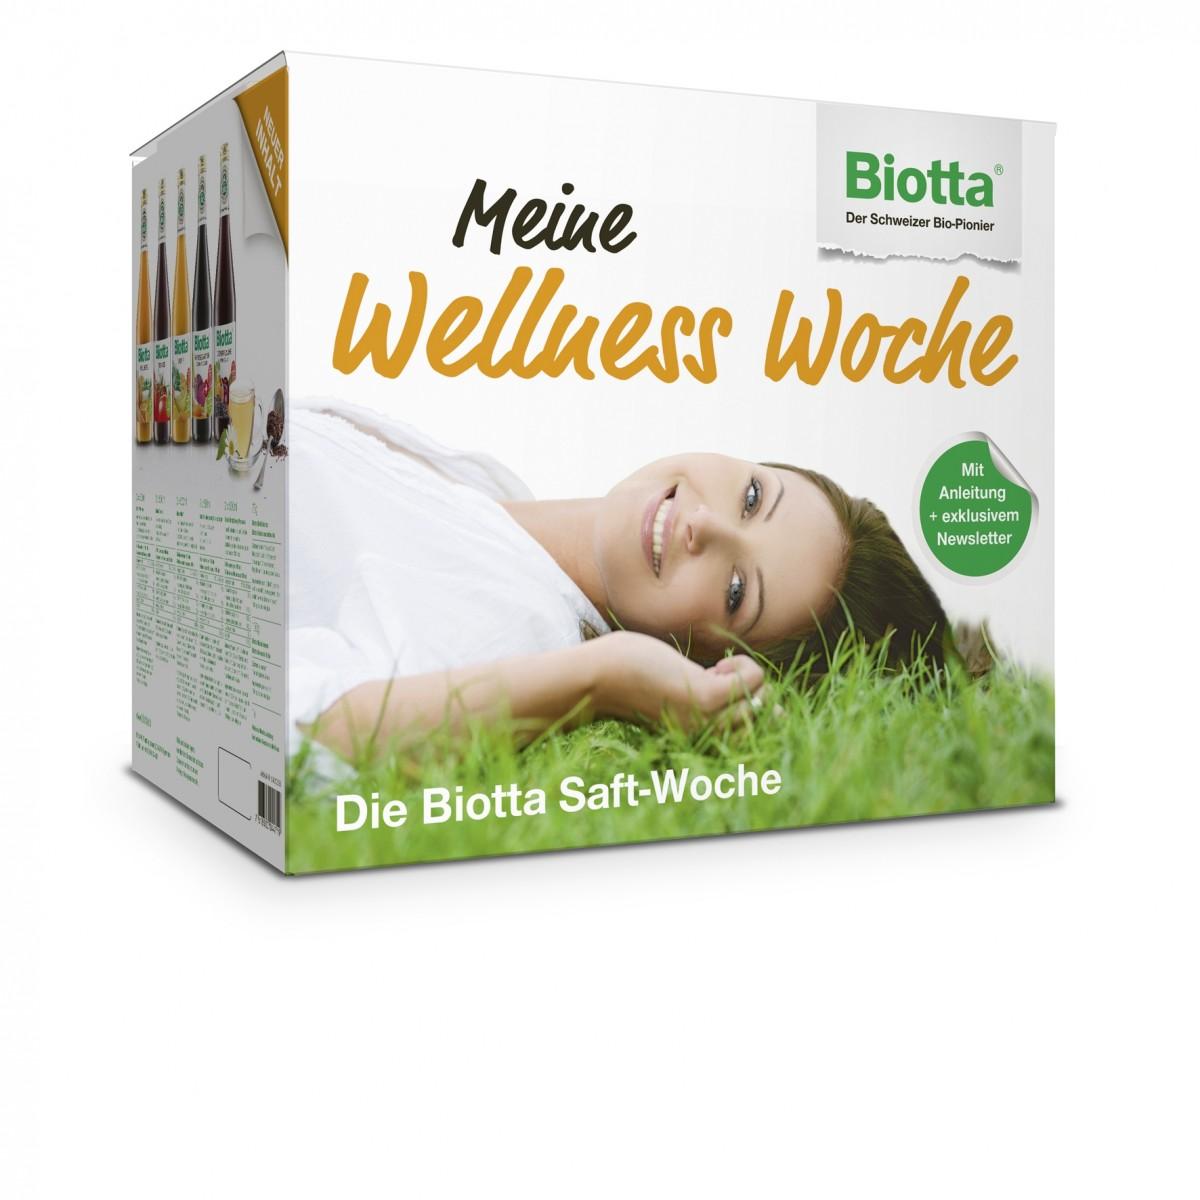 Biotta Wellness Woche